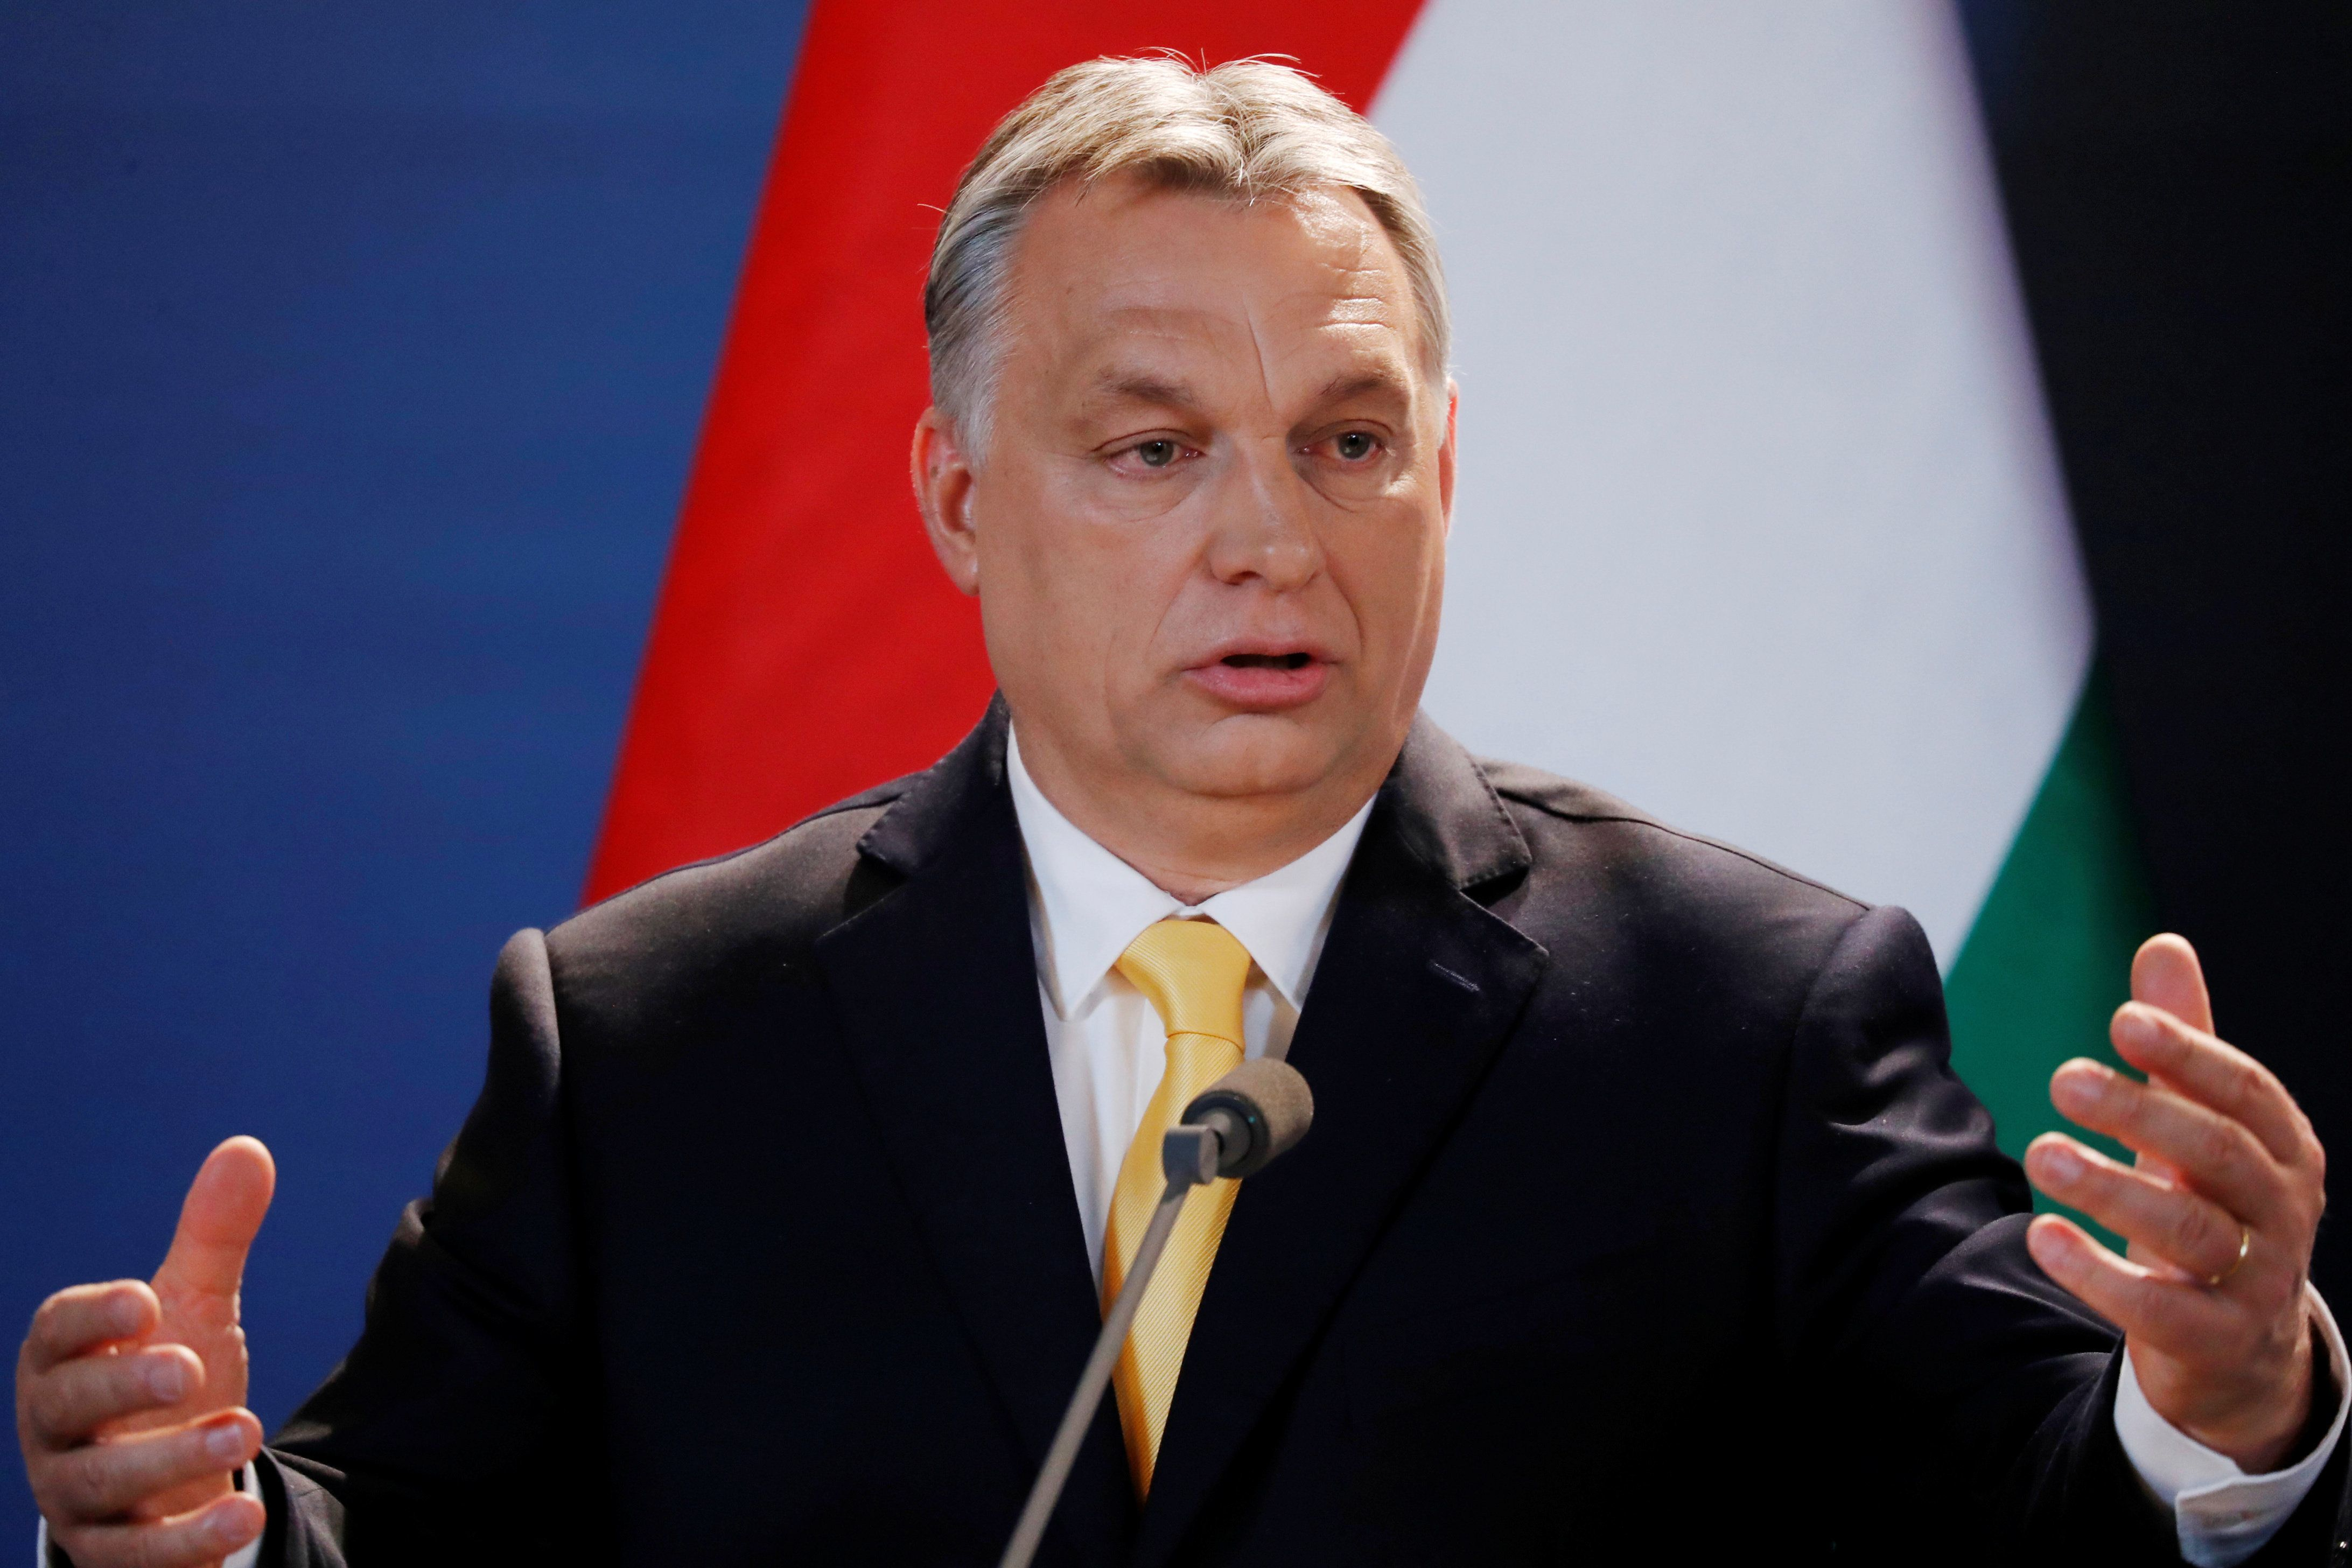 Brüssel verklagt Ungarn wegen dessen